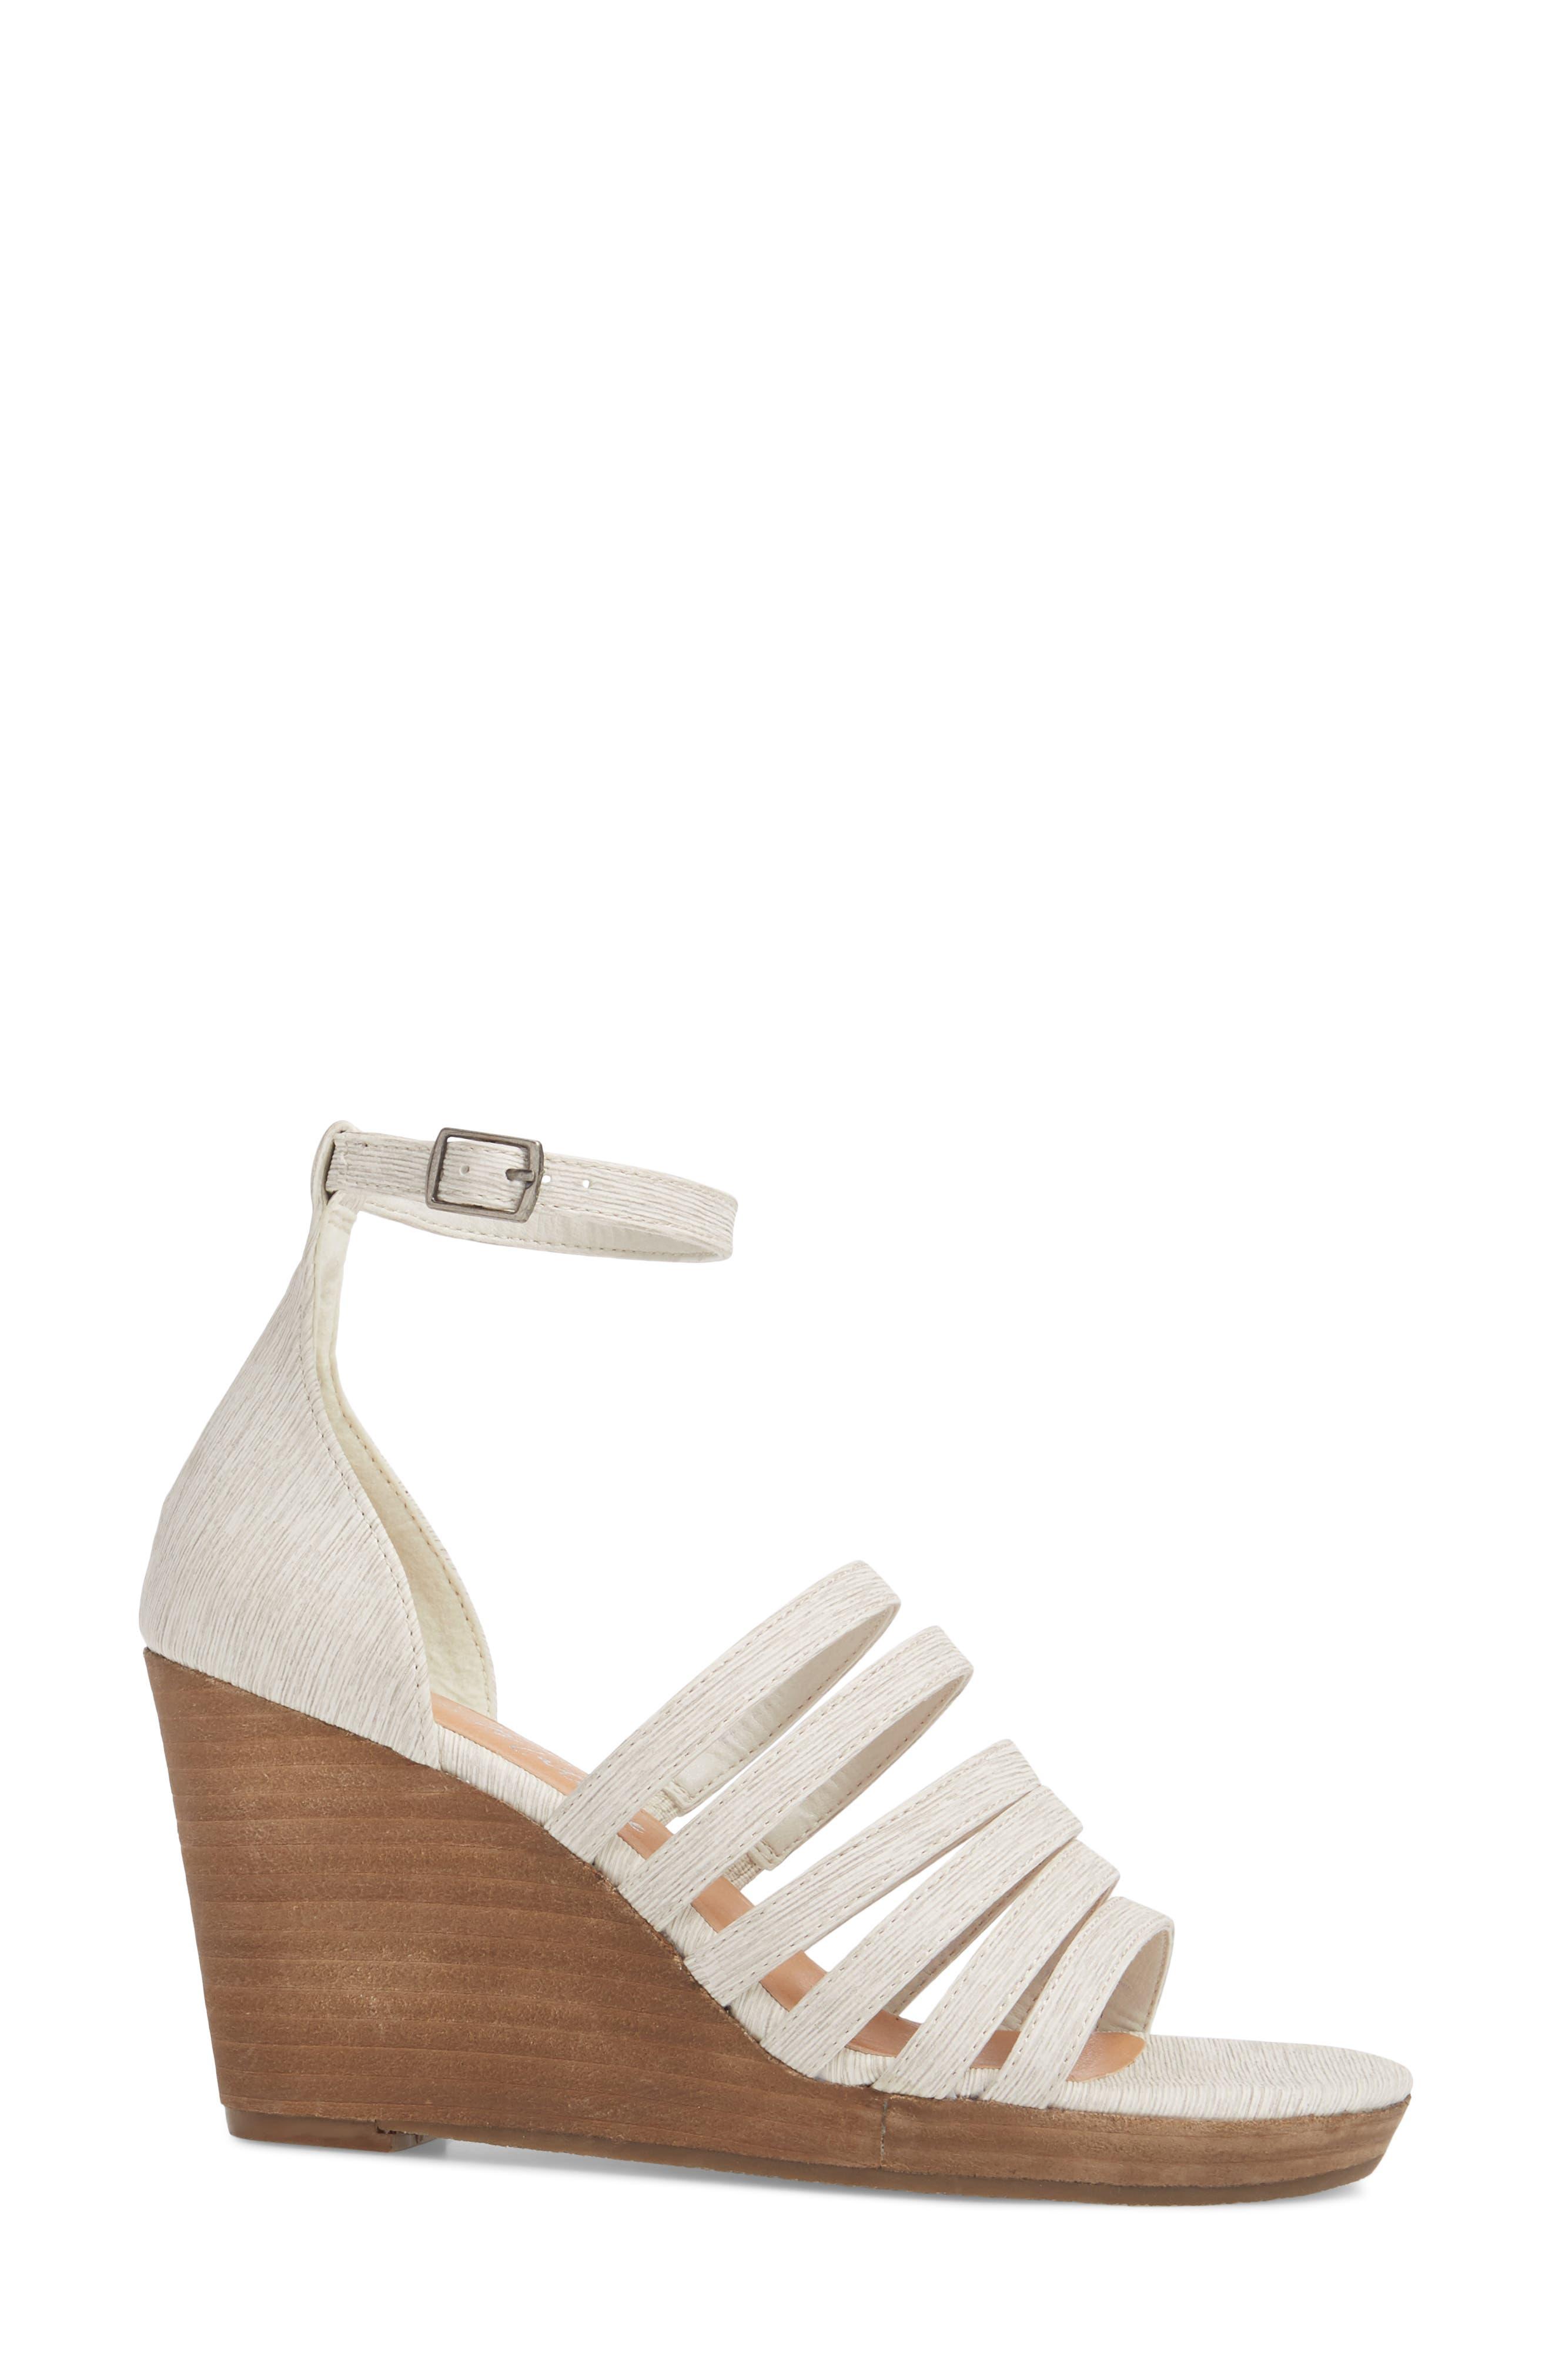 Kiera Wedge Sandal,                             Alternate thumbnail 3, color,                             NATURAL FABRIC